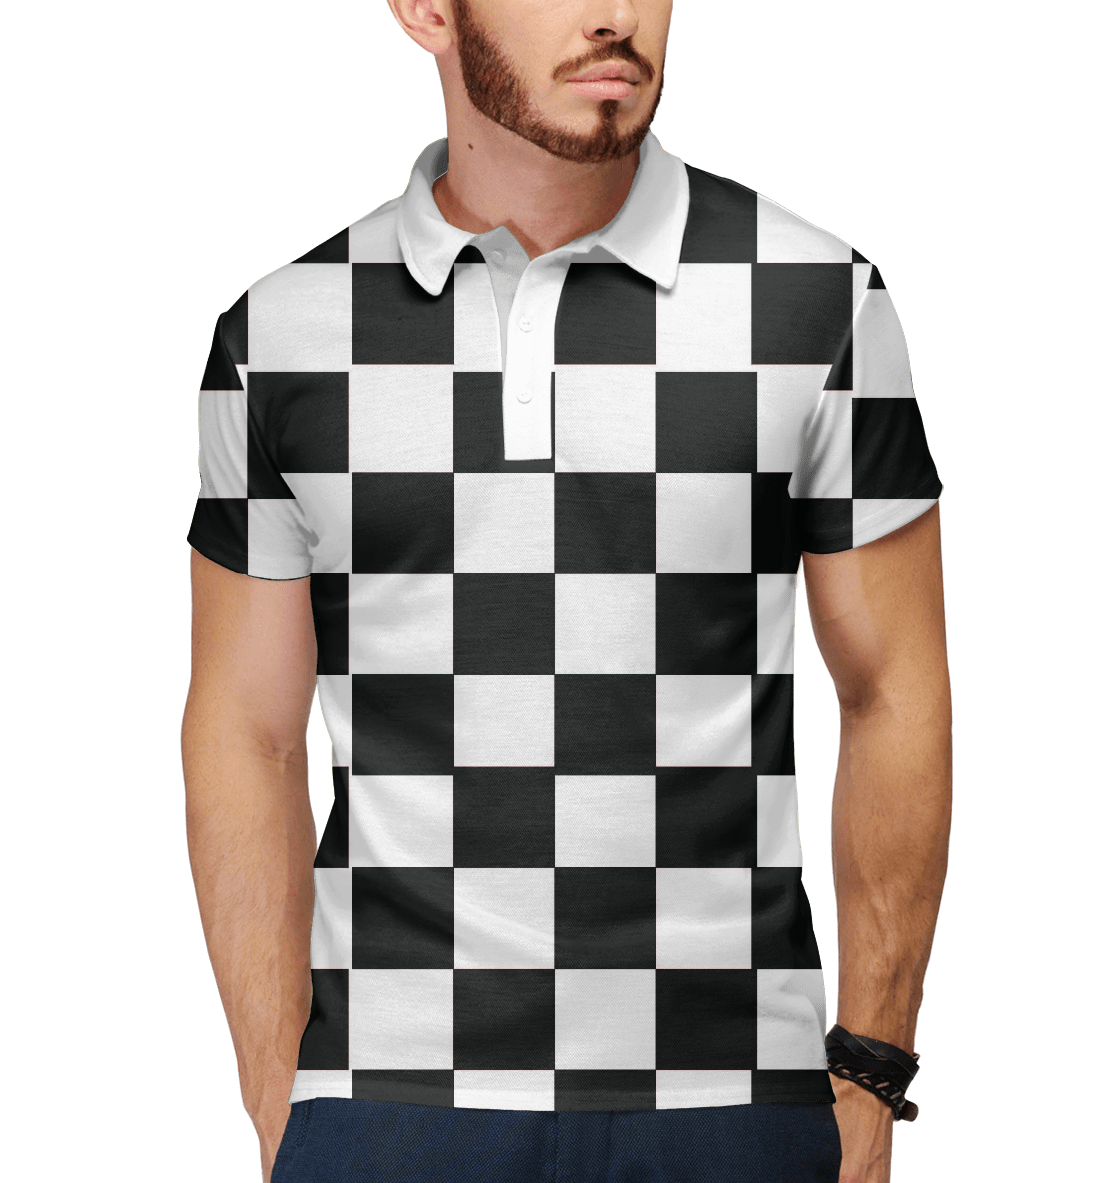 Купить Доска шахматная, Printbar, Поло, APD-461676-pol-2